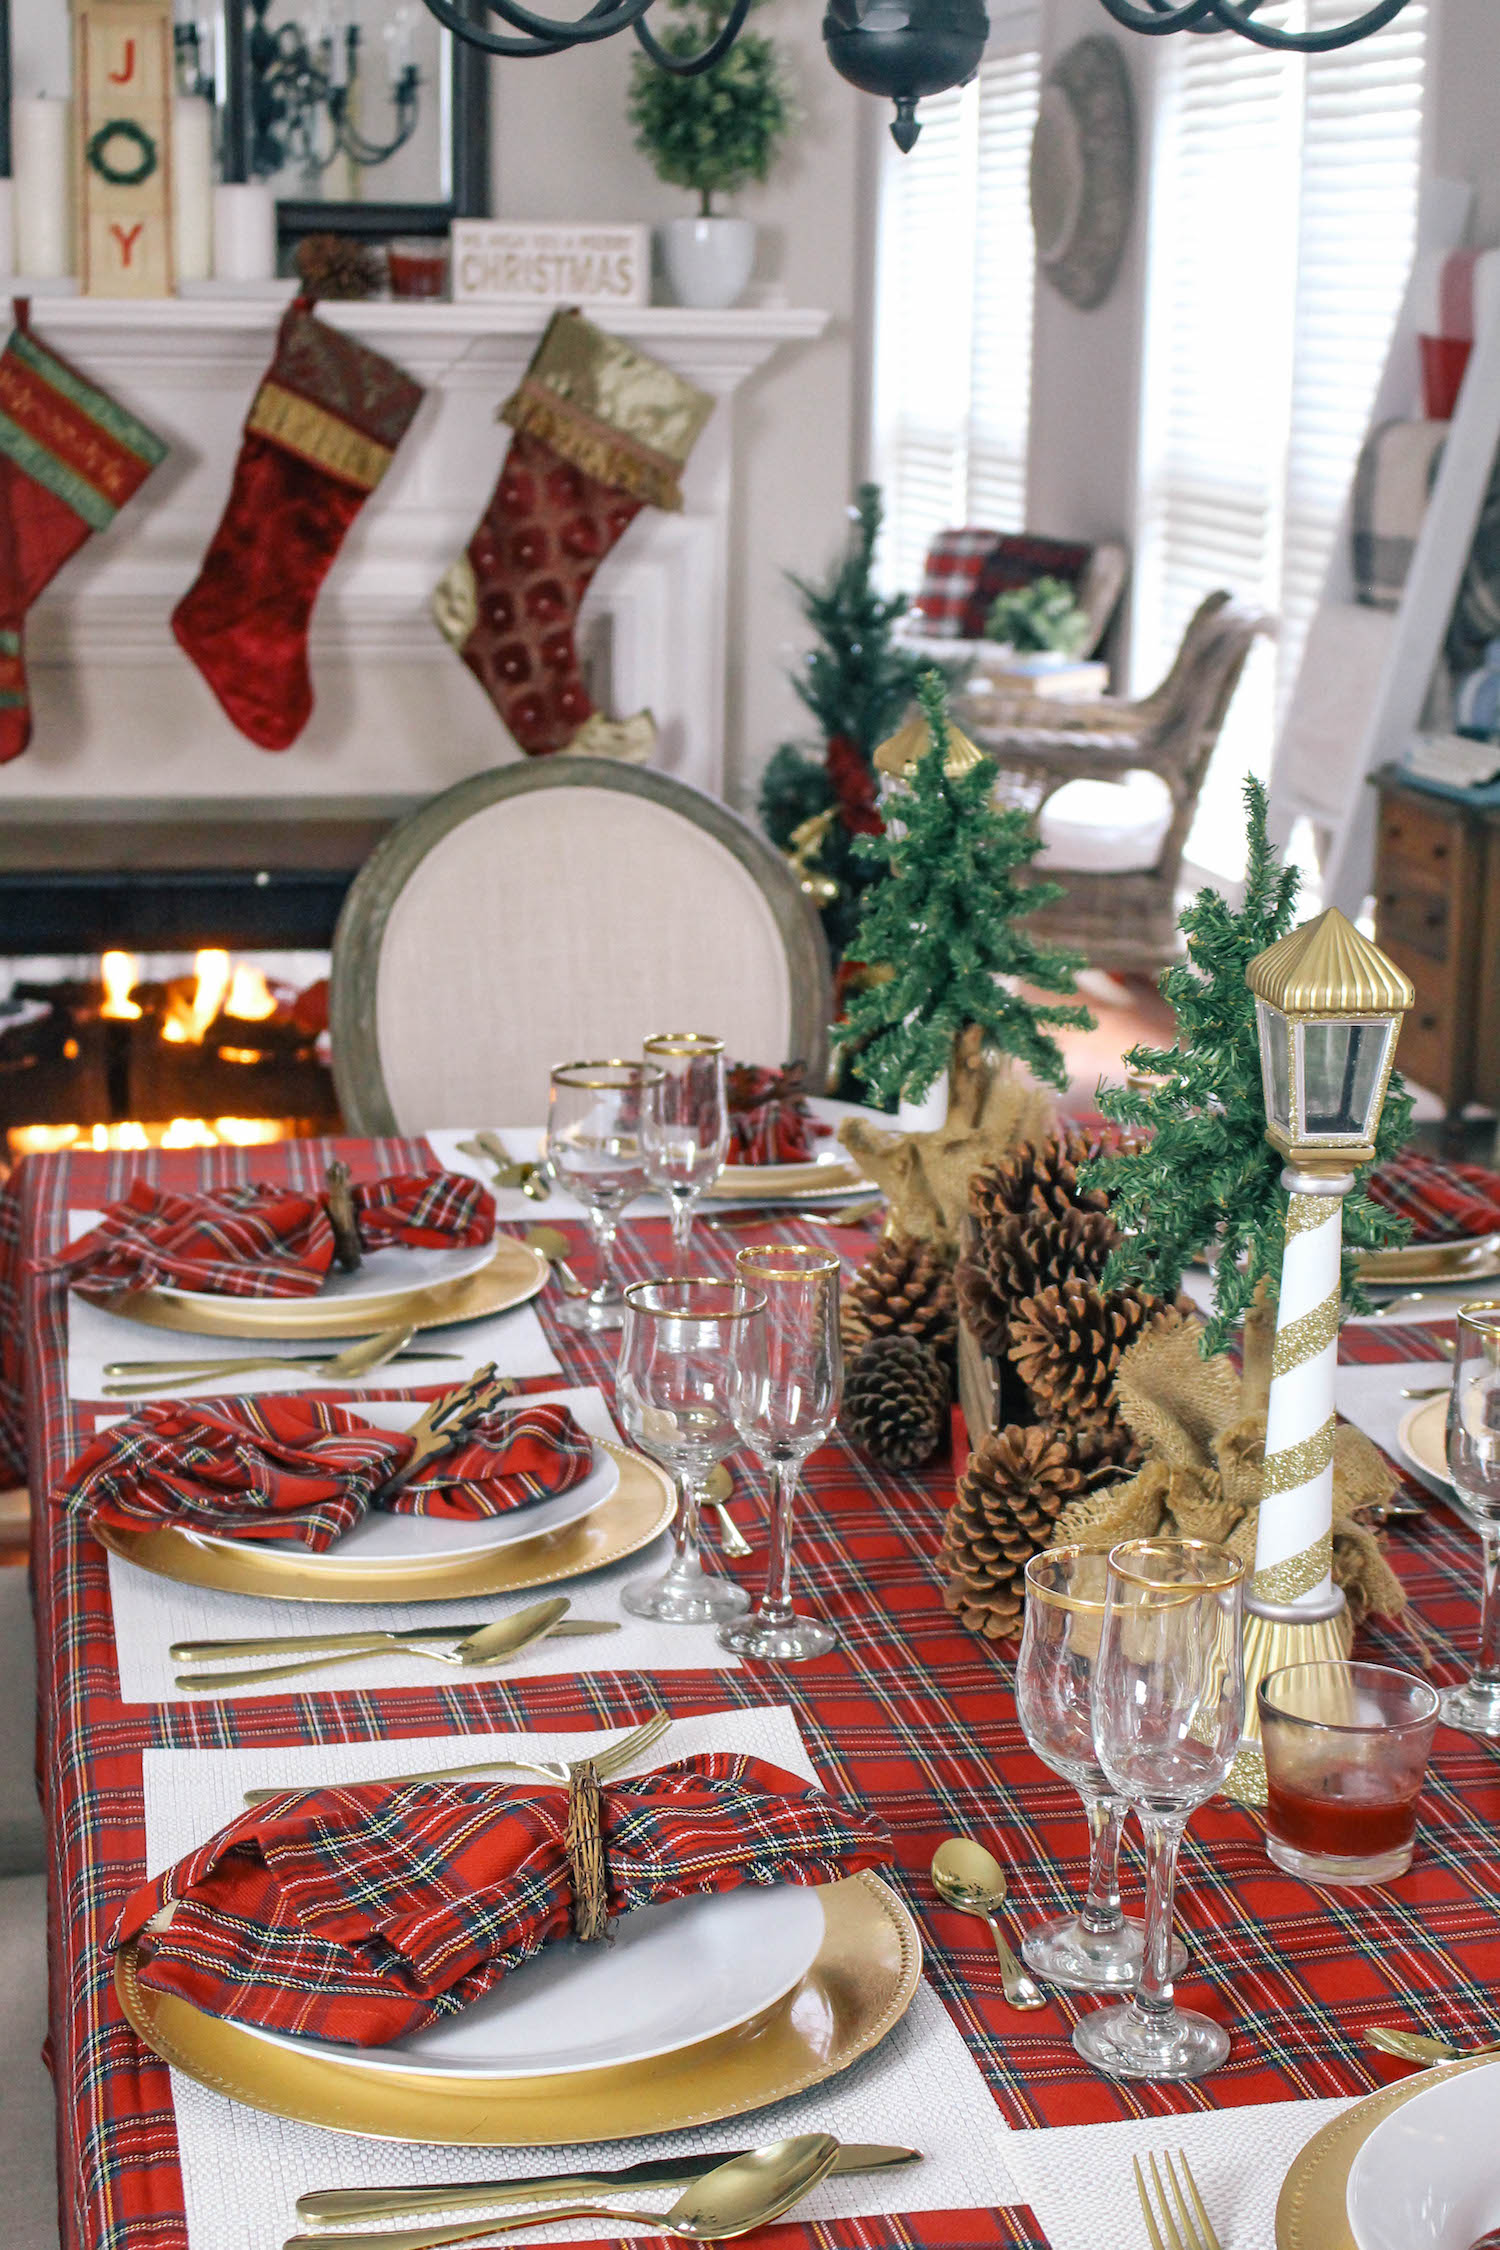 Christmas-Tablescape-Red-Plaid-Decor-7